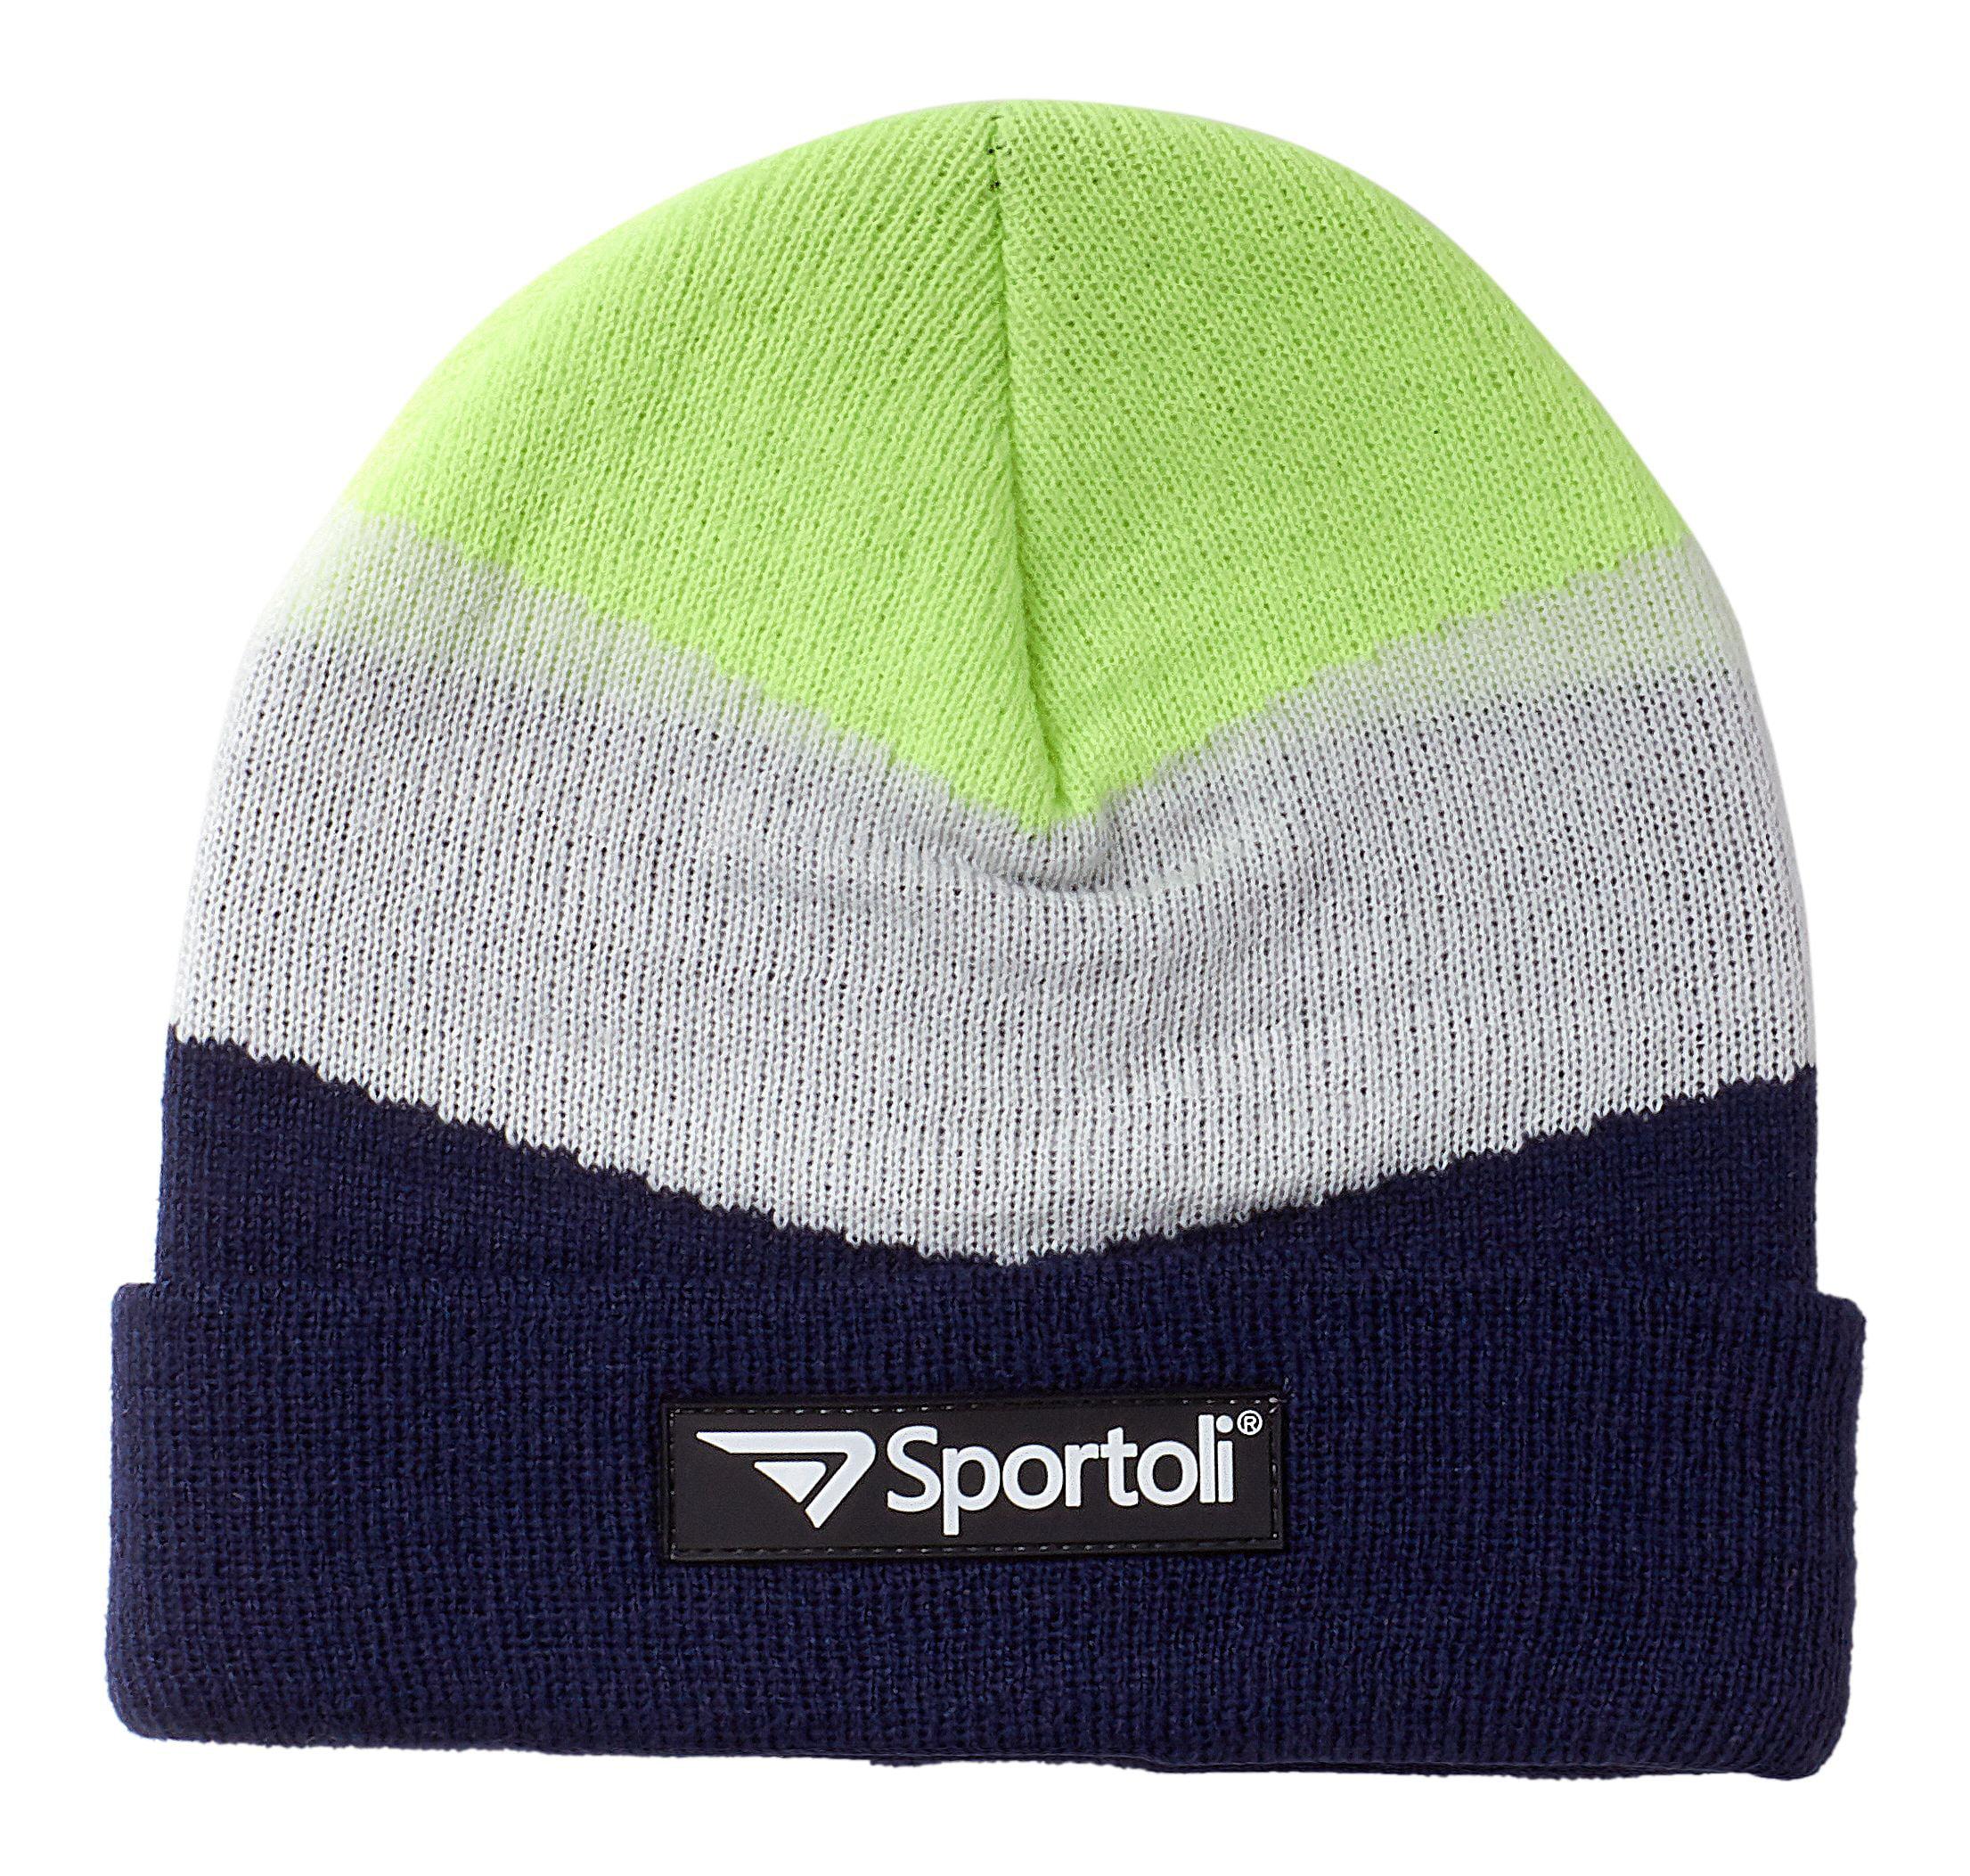 c13e04cb Sportoli - Sportoli Men's and Boys' Kids 3-Piece Chevron Jersey Knit Cold  Weather Accessory Set Warm Lined Pull On Hat Scarf and Gloves - Walmart.com